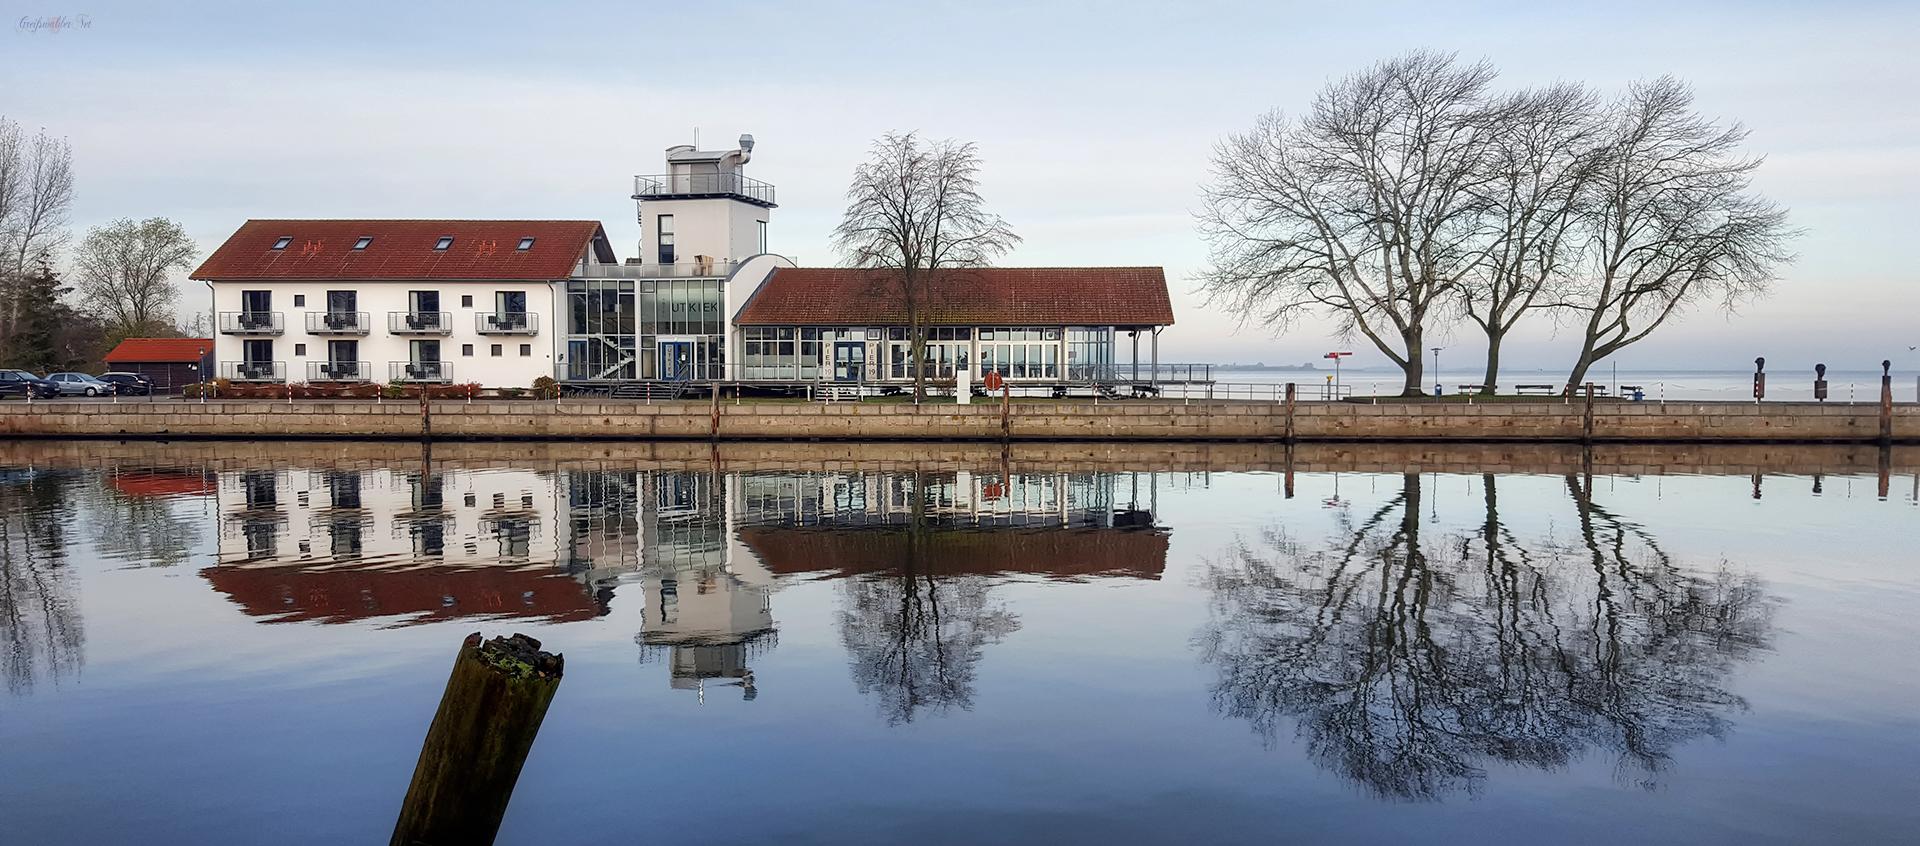 Spiegelung am Utkiek in Greifswald-Wieck